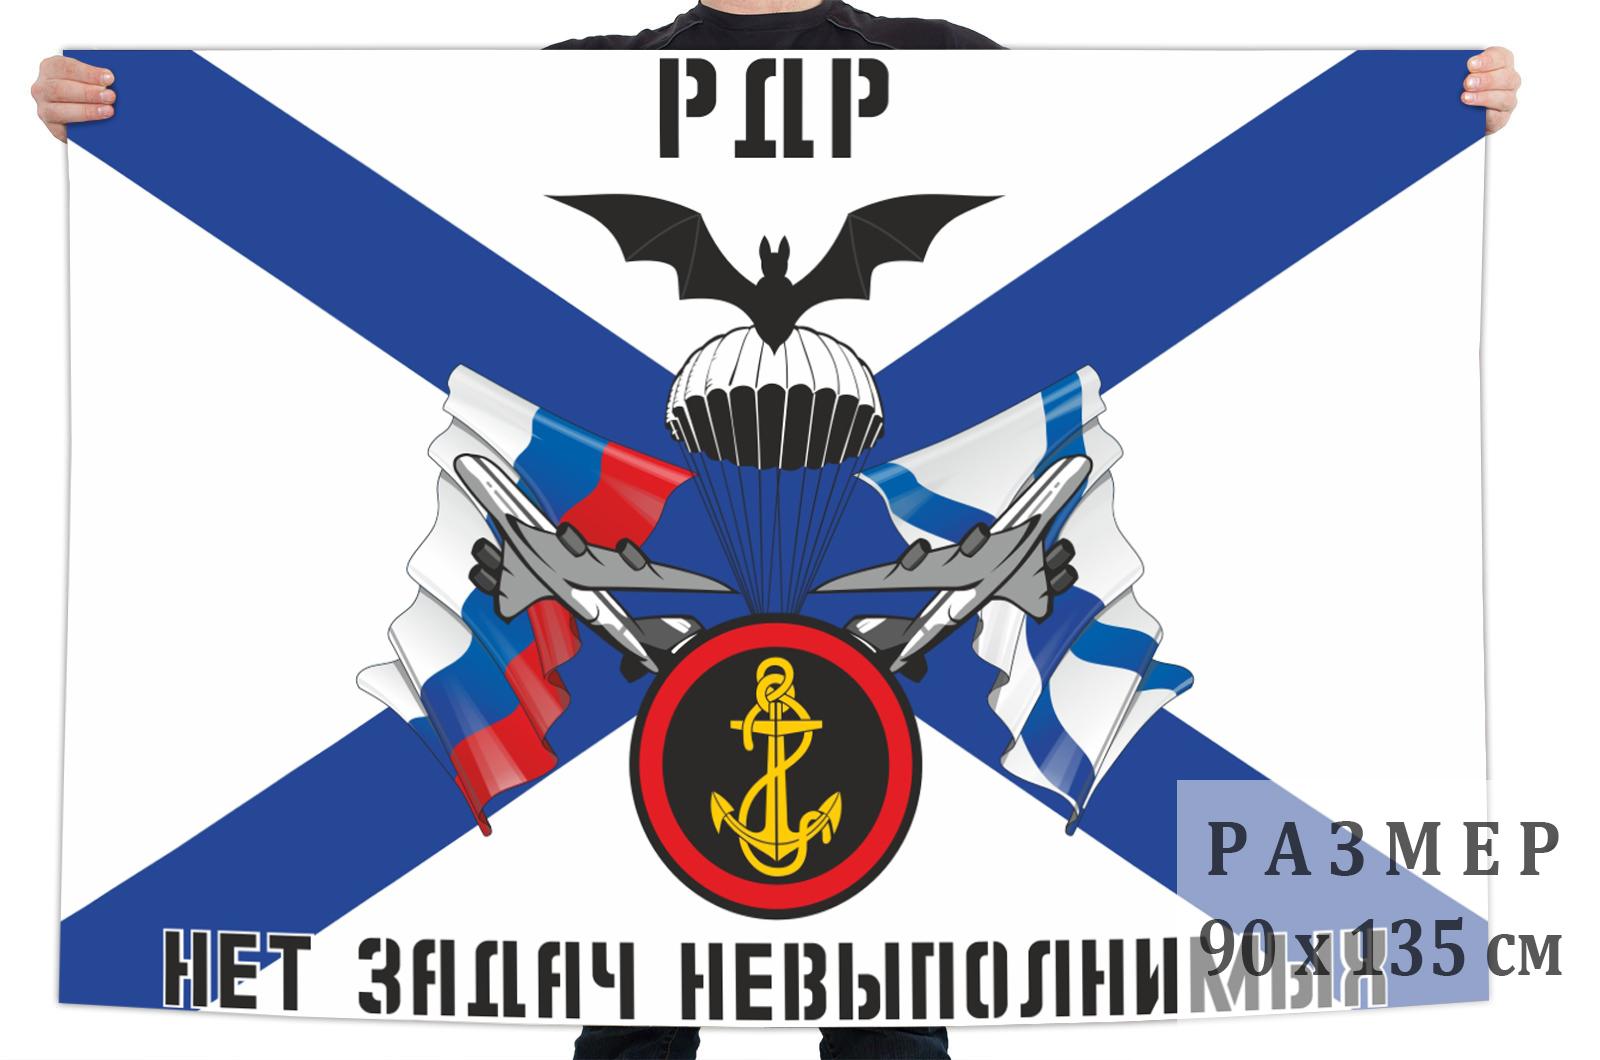 Флаг РДР морской пехоты РФ